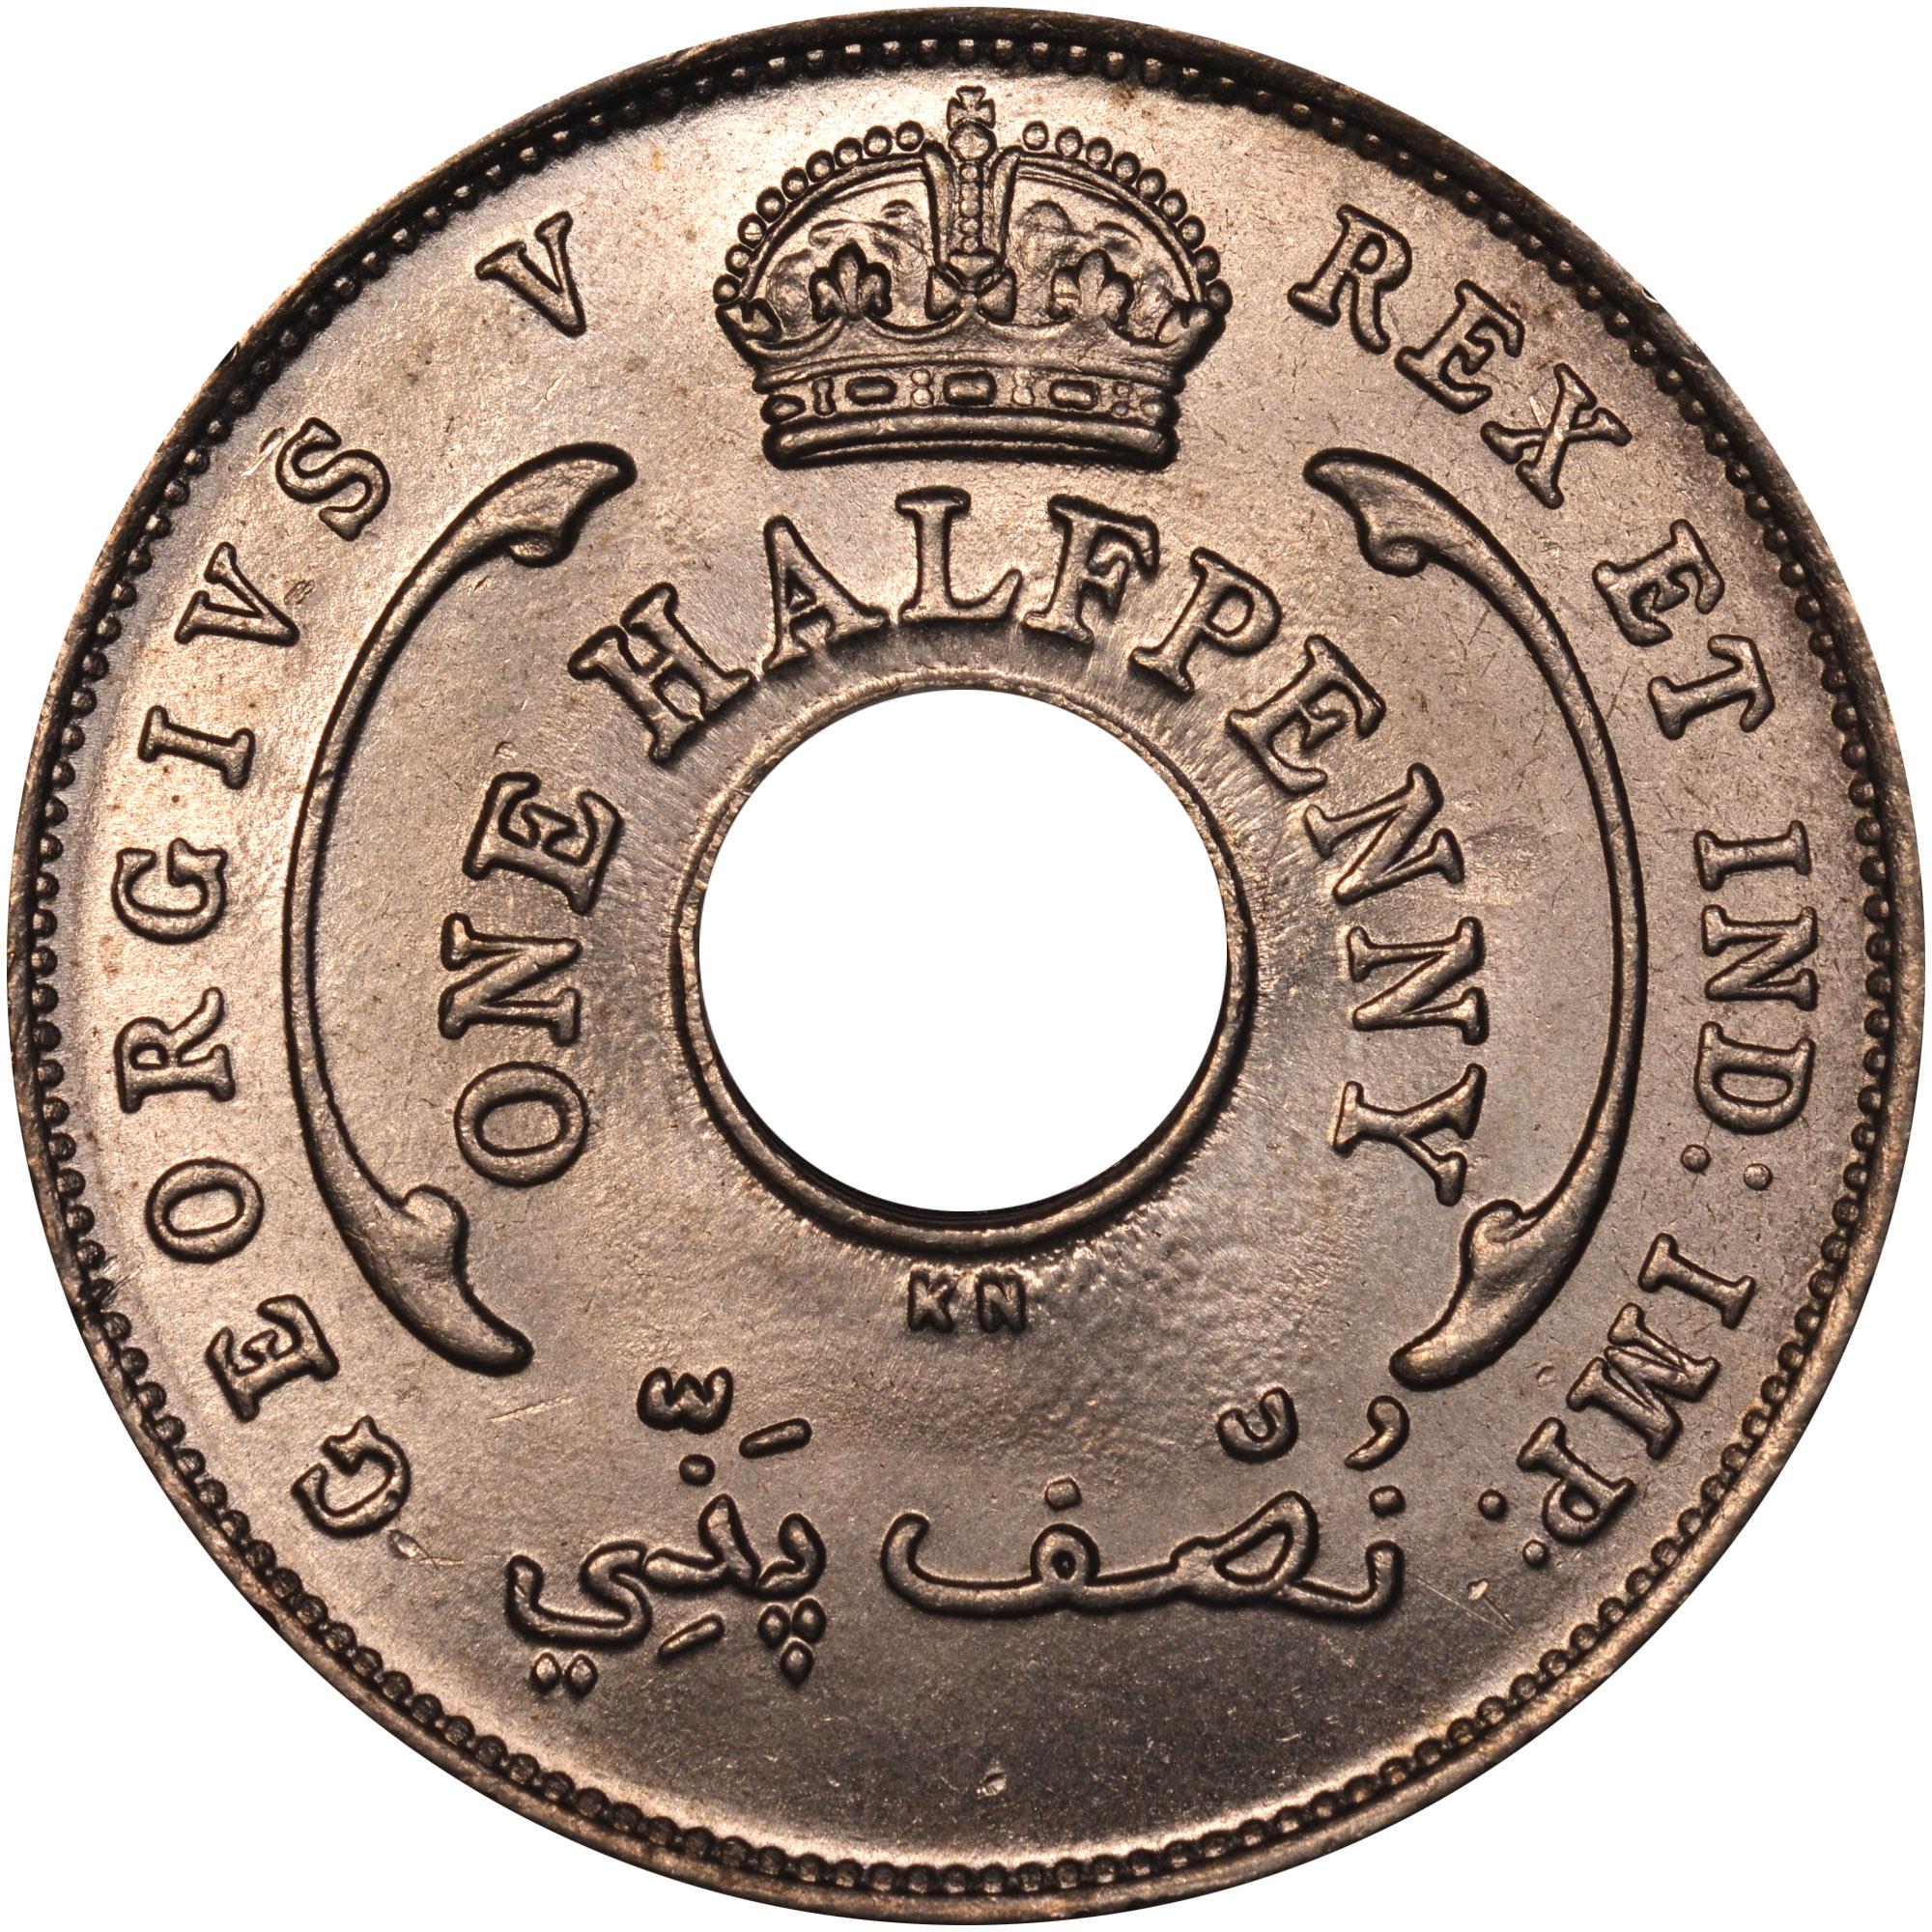 1912-1936 British West Africa 1/2 Penny obverse